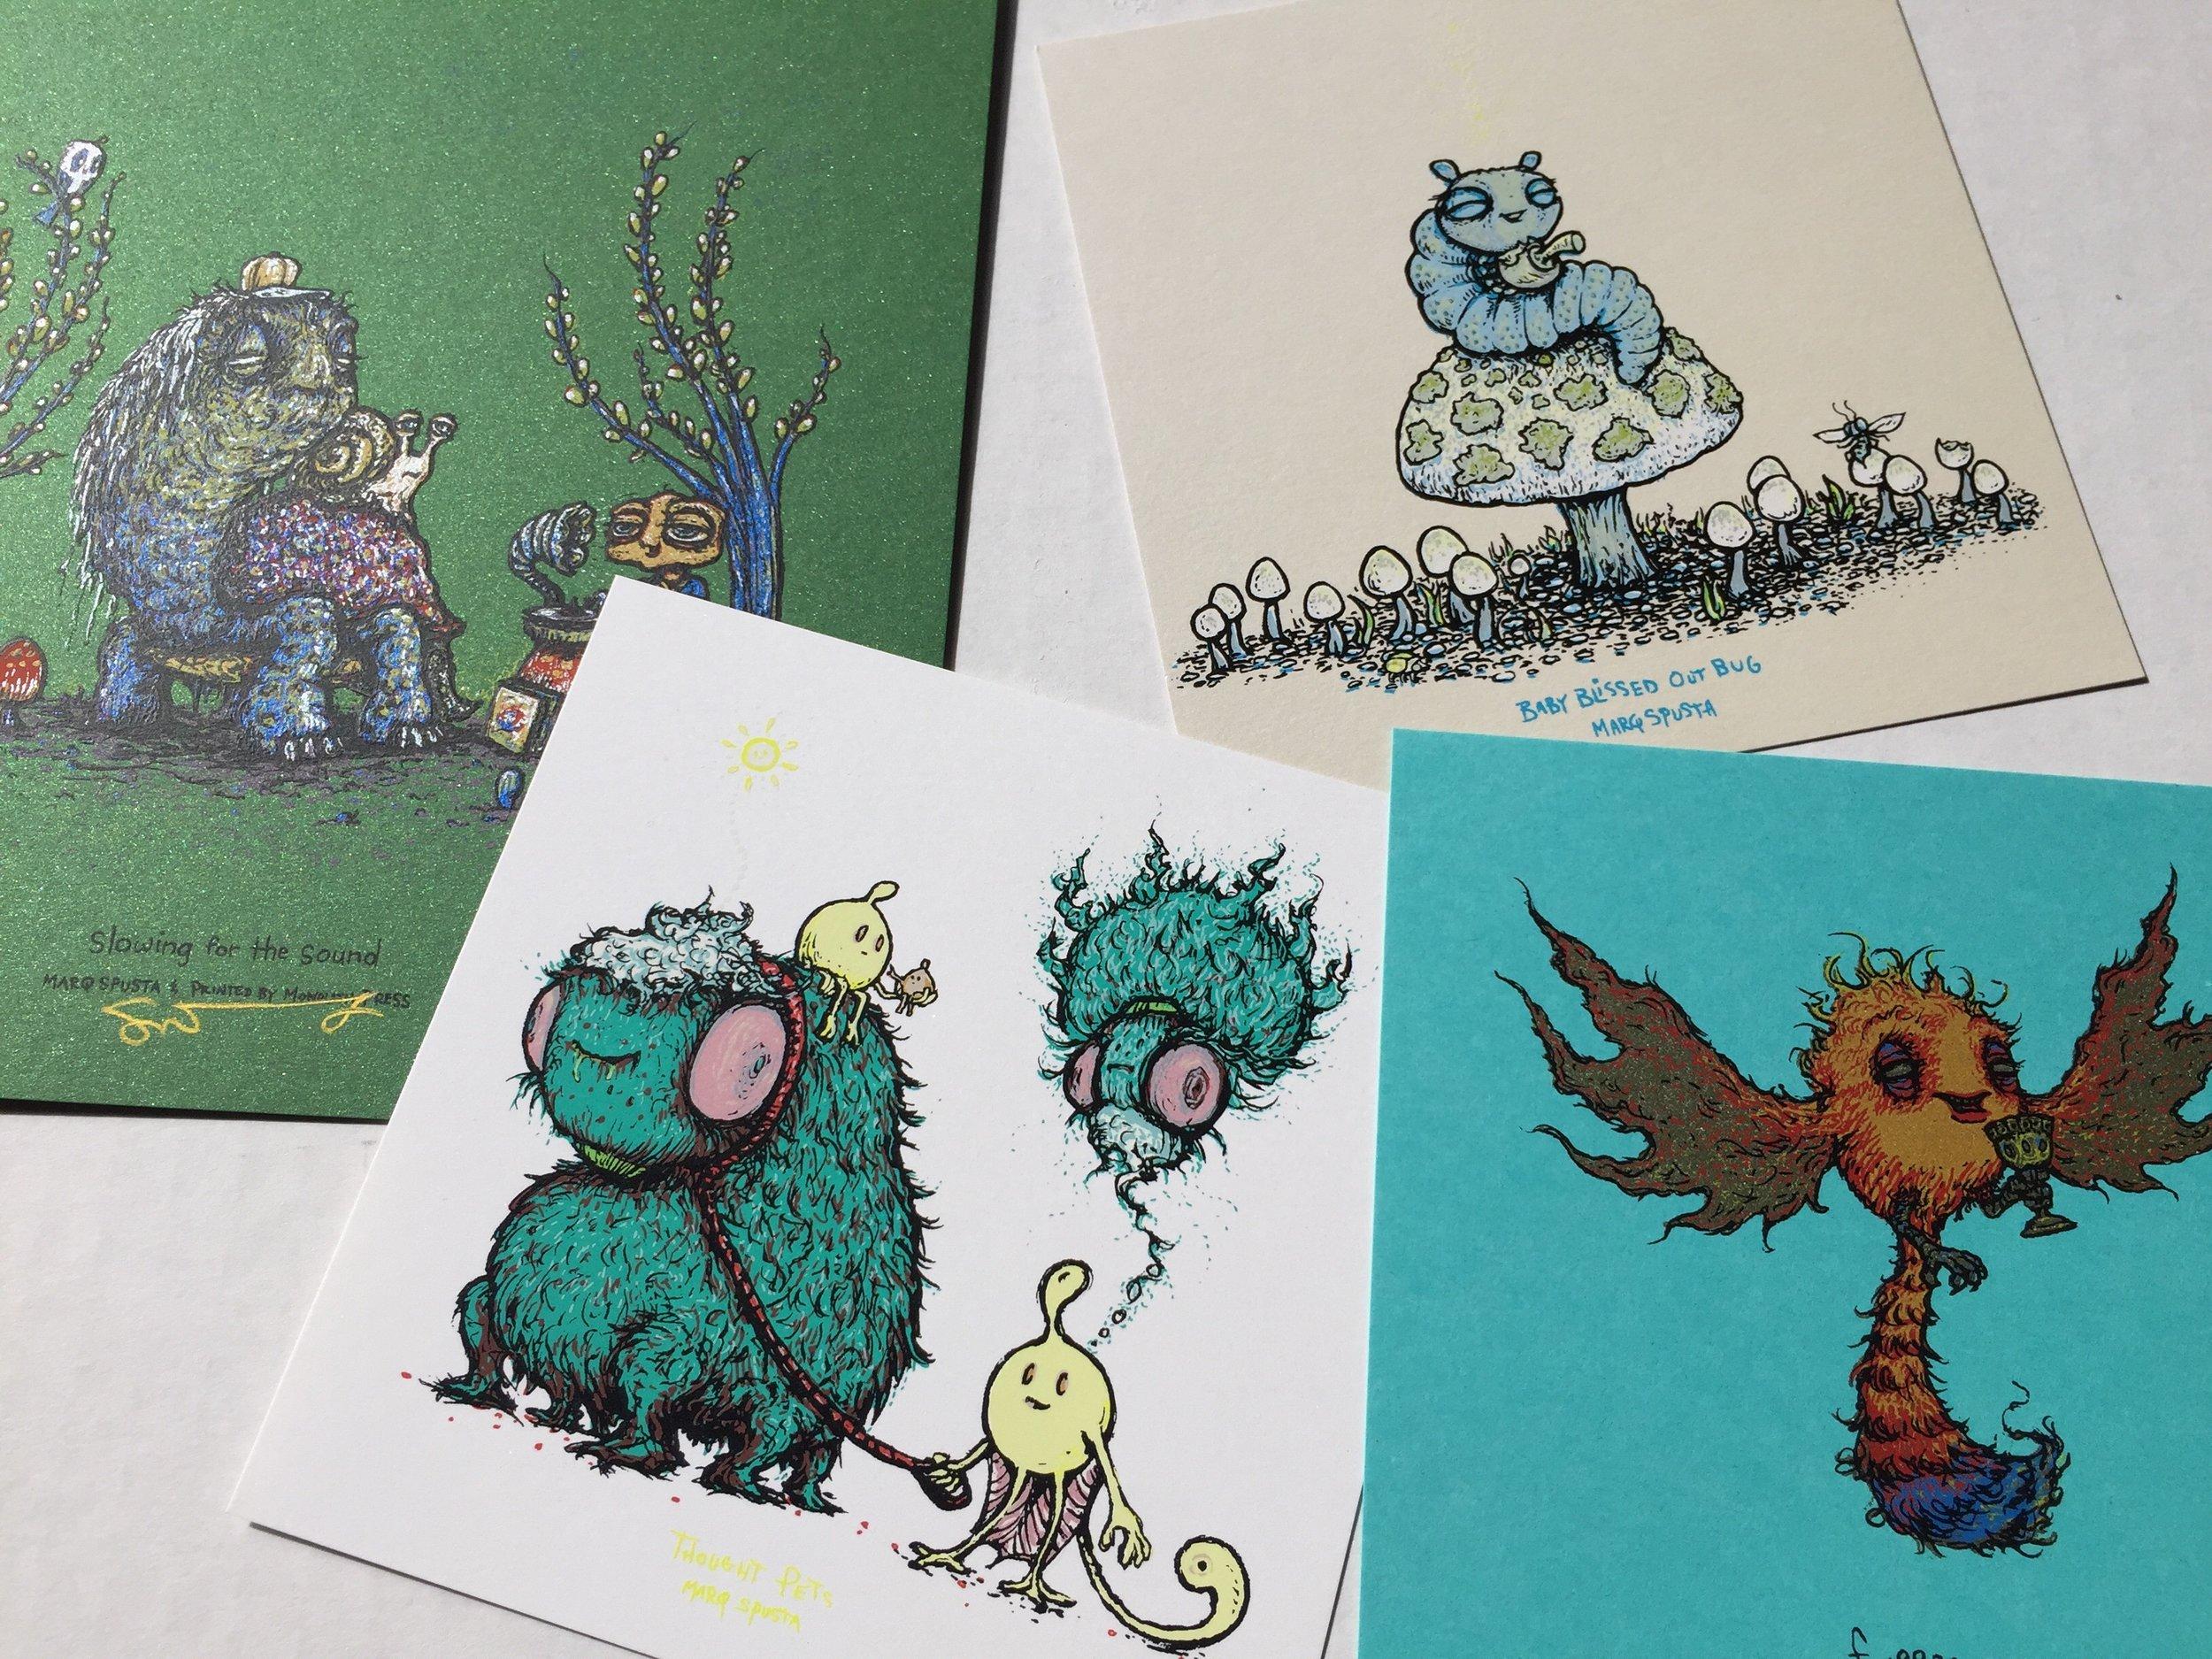 Pack 8 (4 prints)